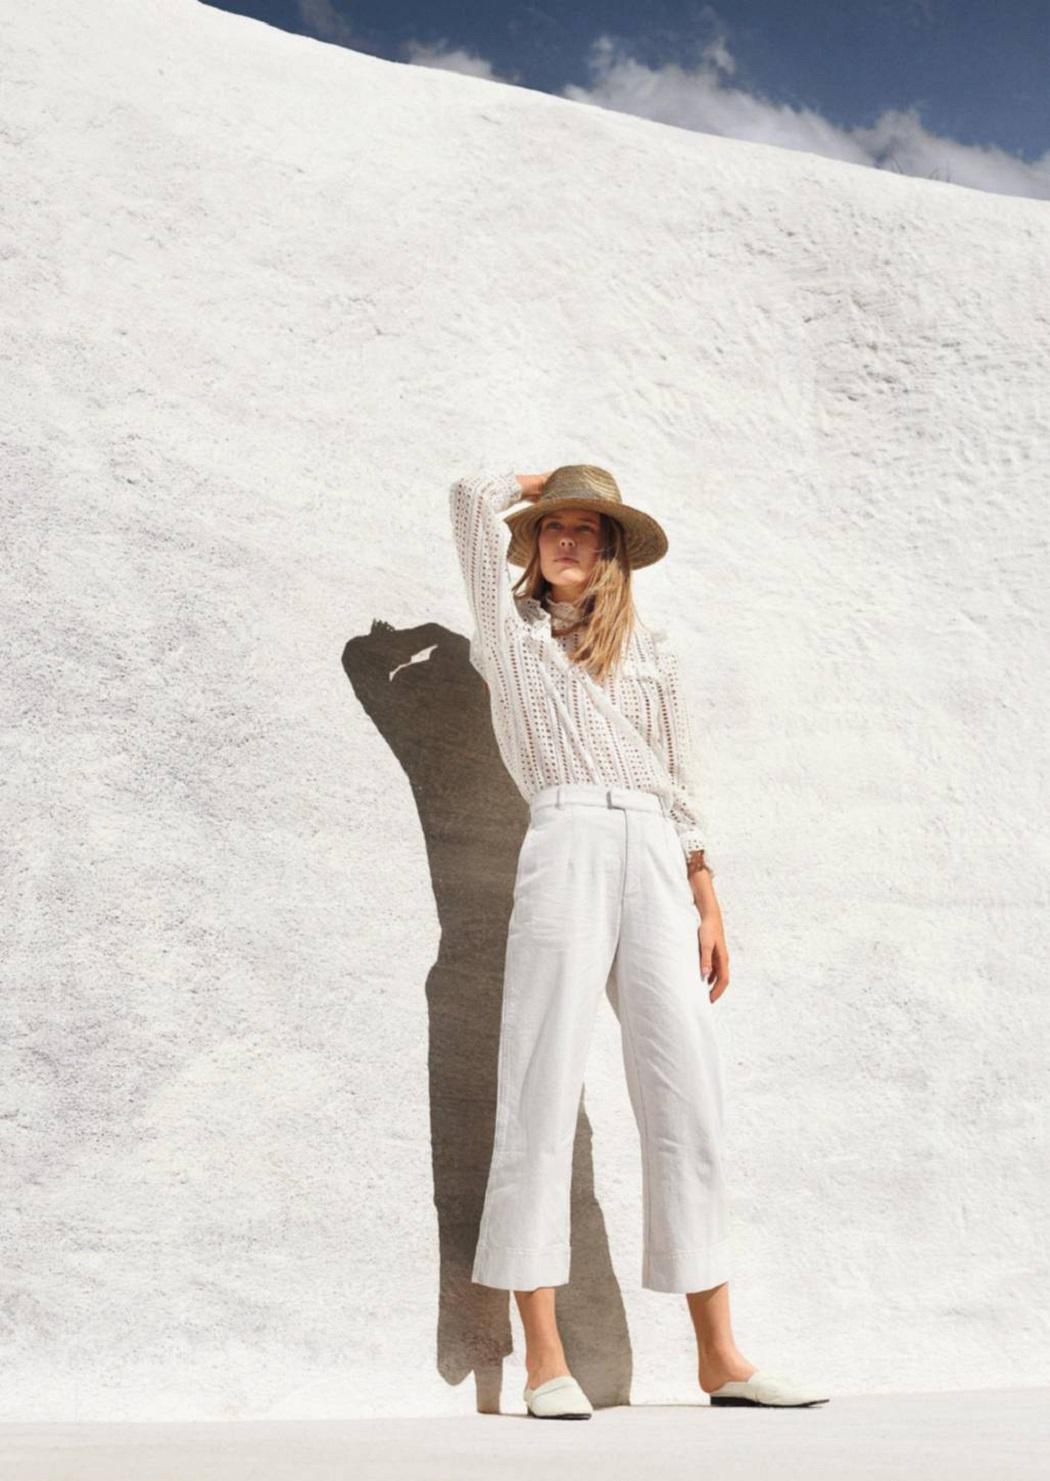 блузка, Claudie Pierot; брюки из хлопка, IKKS; соломенная шляпа, Emmanuelle Khanh; мюли, Victoria Beckham